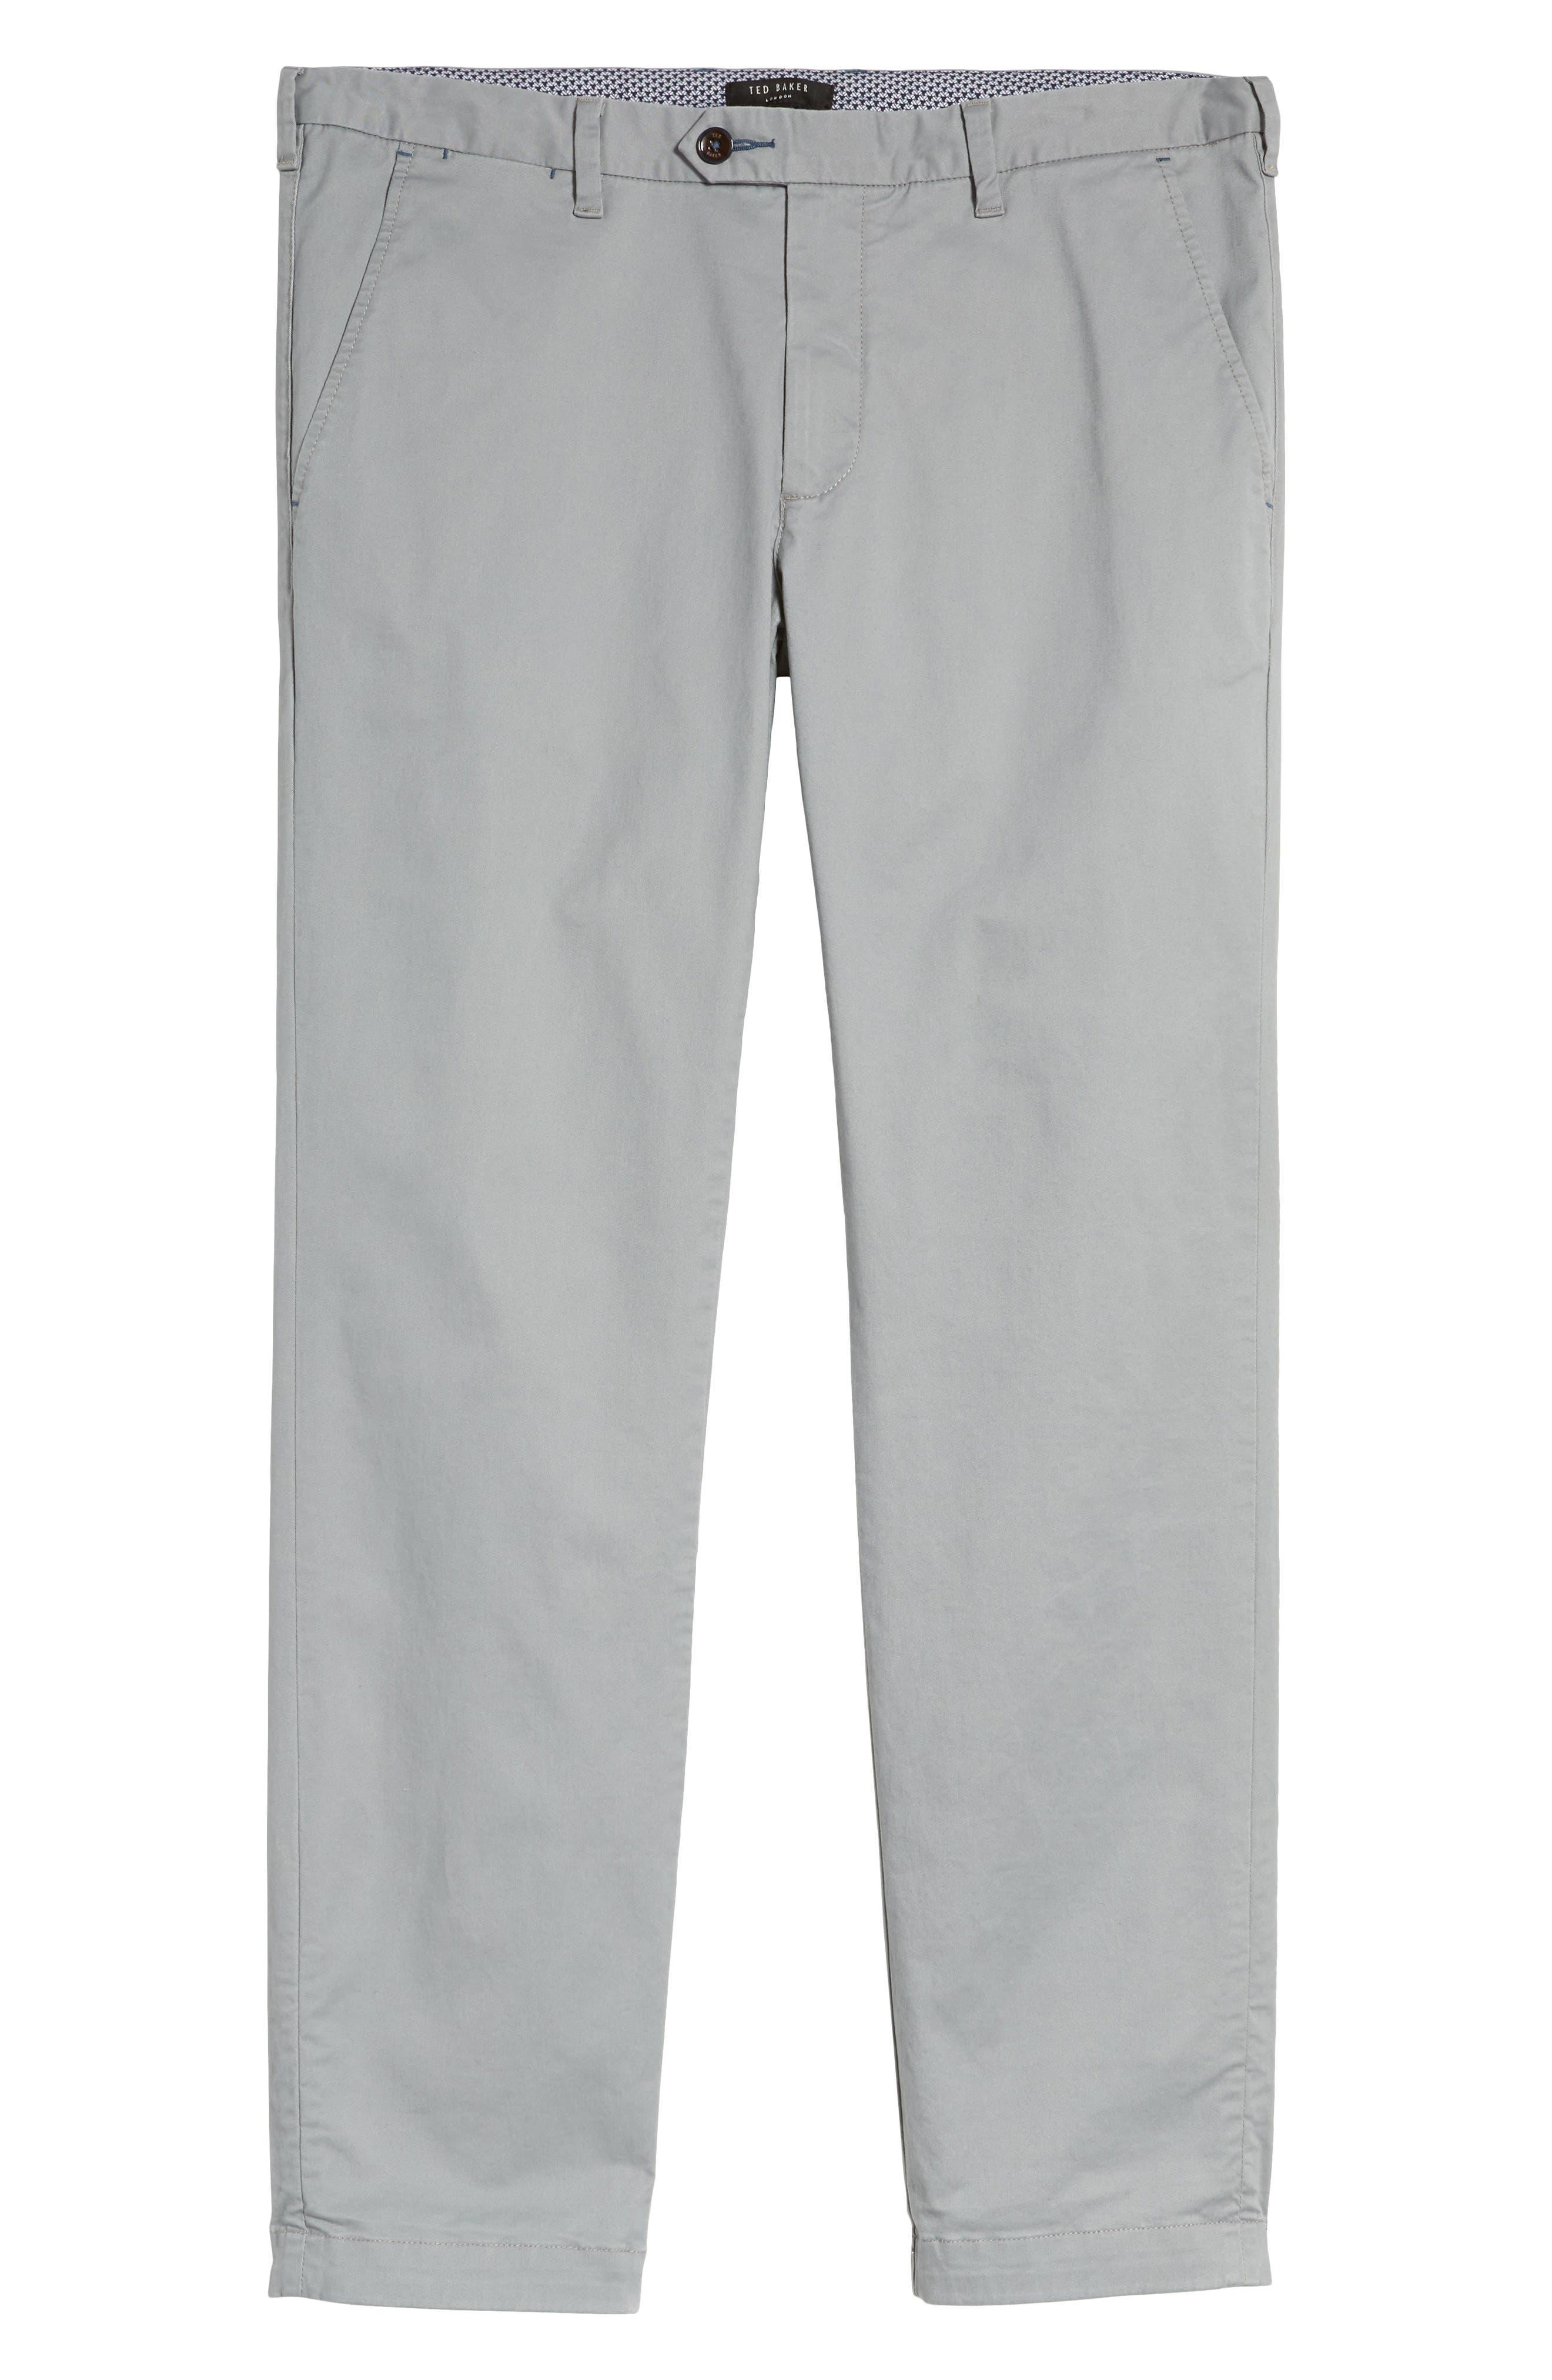 Proctt Flat Front Stretch Solid Cotton Pants,                             Alternate thumbnail 6, color,                             Light Grey